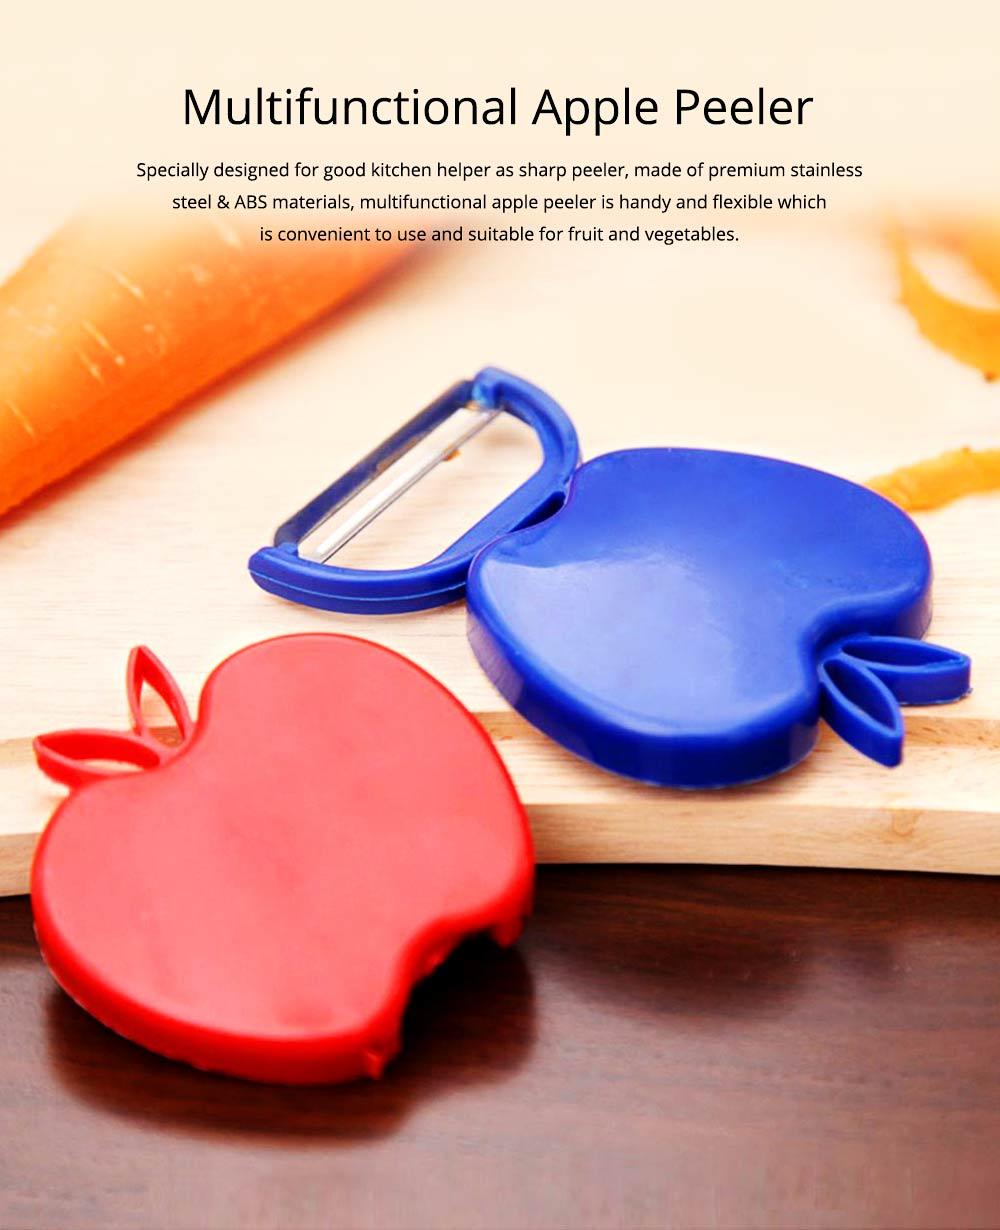 Multifunctional Foldable Peeler Knife with Apple Shape, Portable Vegetable Potato Fruit Peeler, Kitchen Cut Tools 0